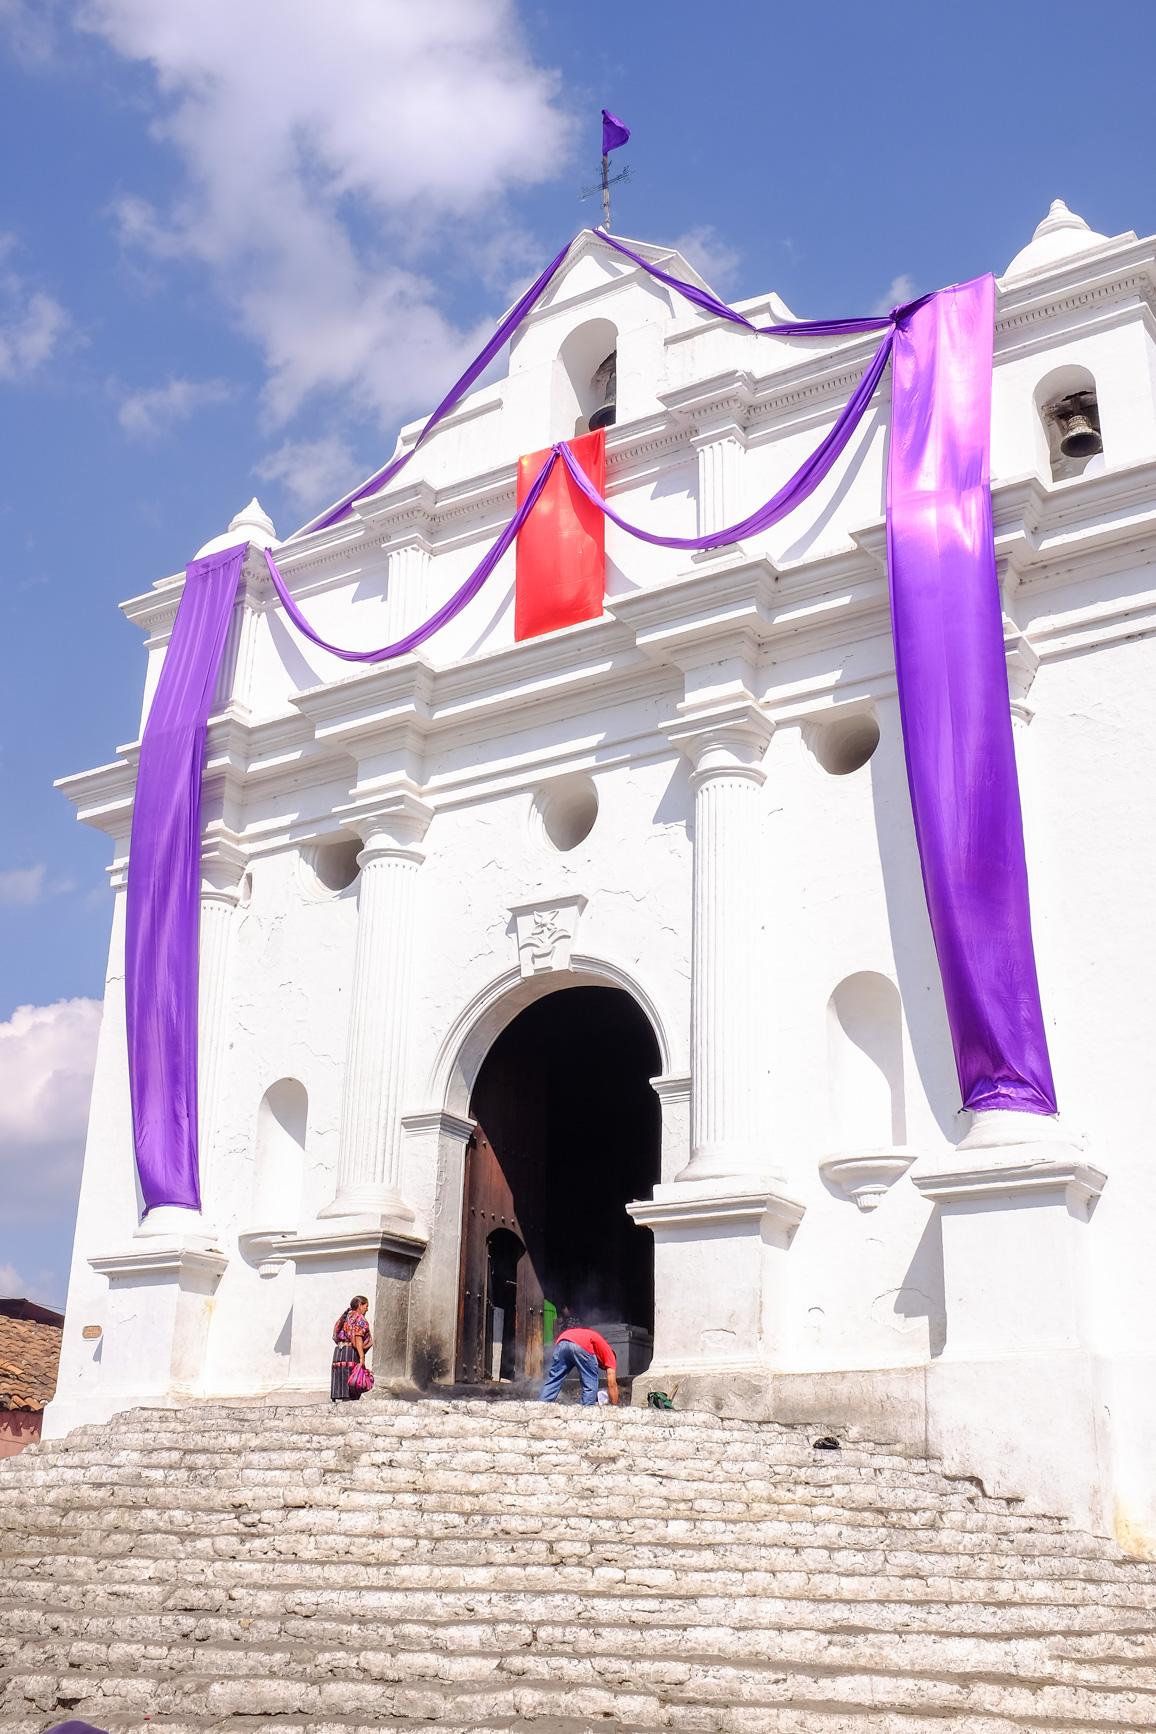 https://bubo.sk/uploads/galleries/7338/katkaliskovast_guatemala_-130-.jpg